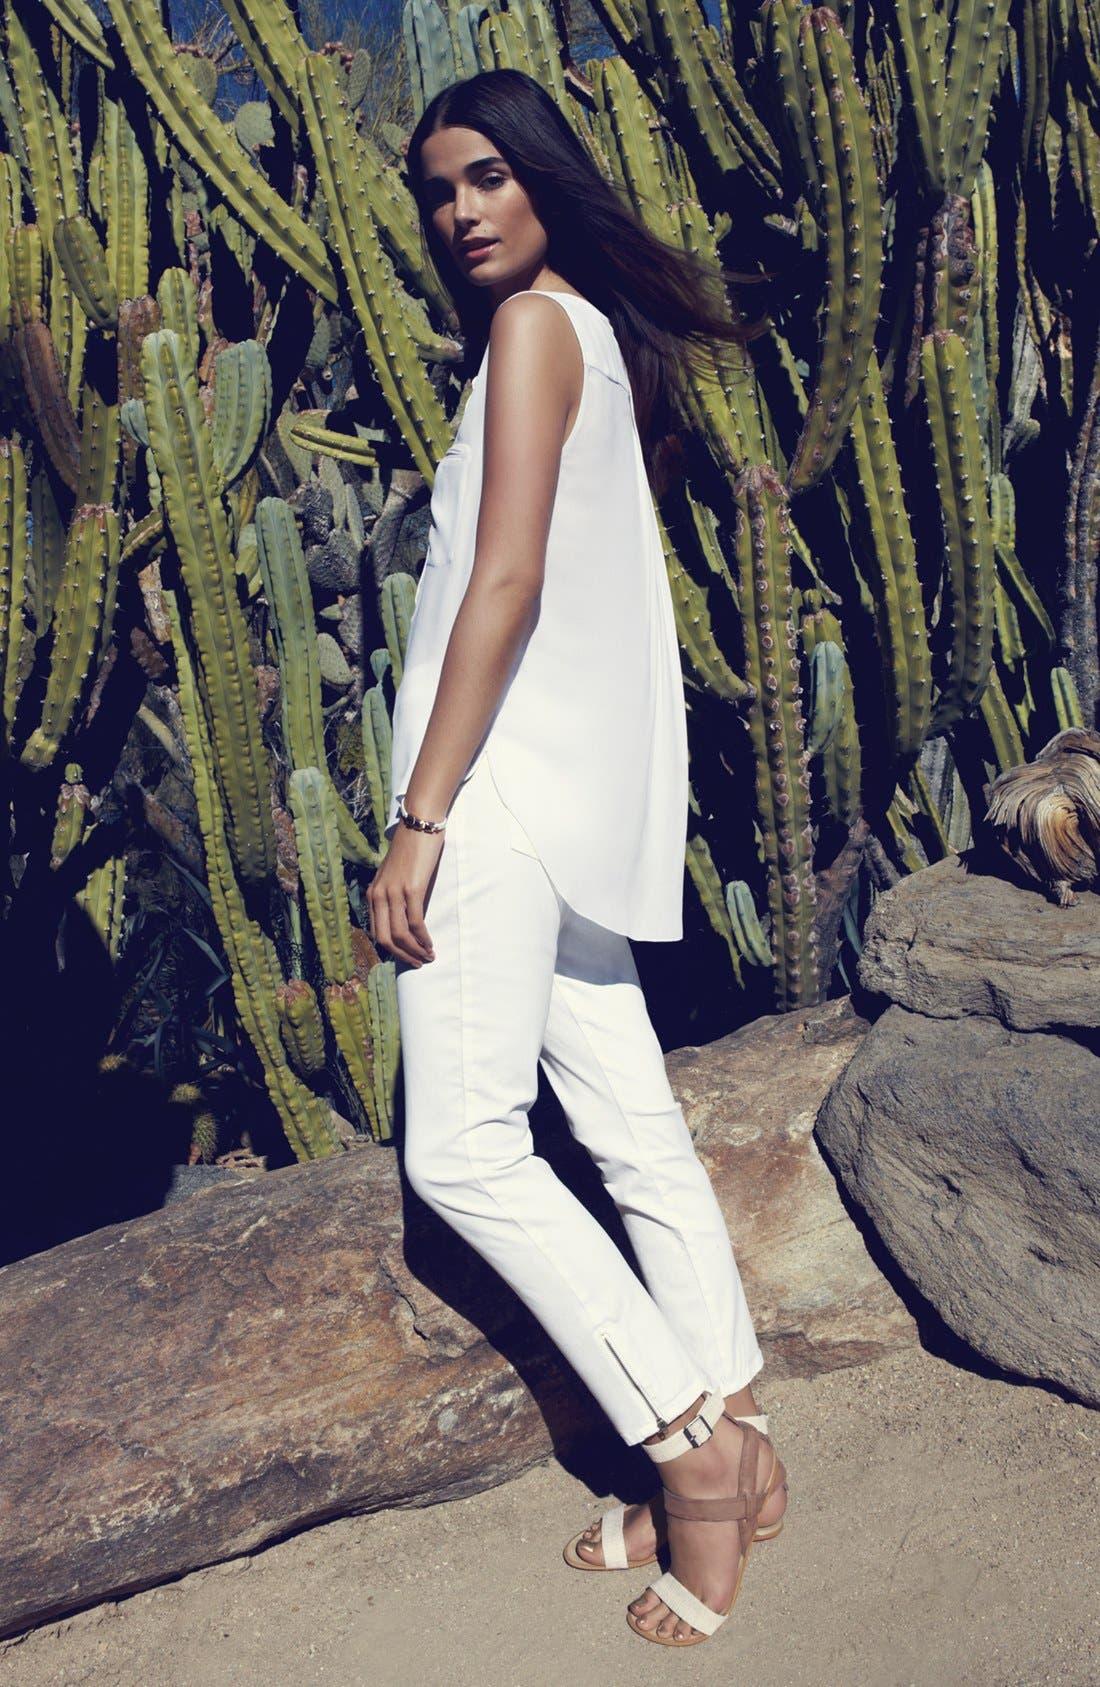 Main Image - NYDJ Blouse & 'Angelina' Denim Leggings